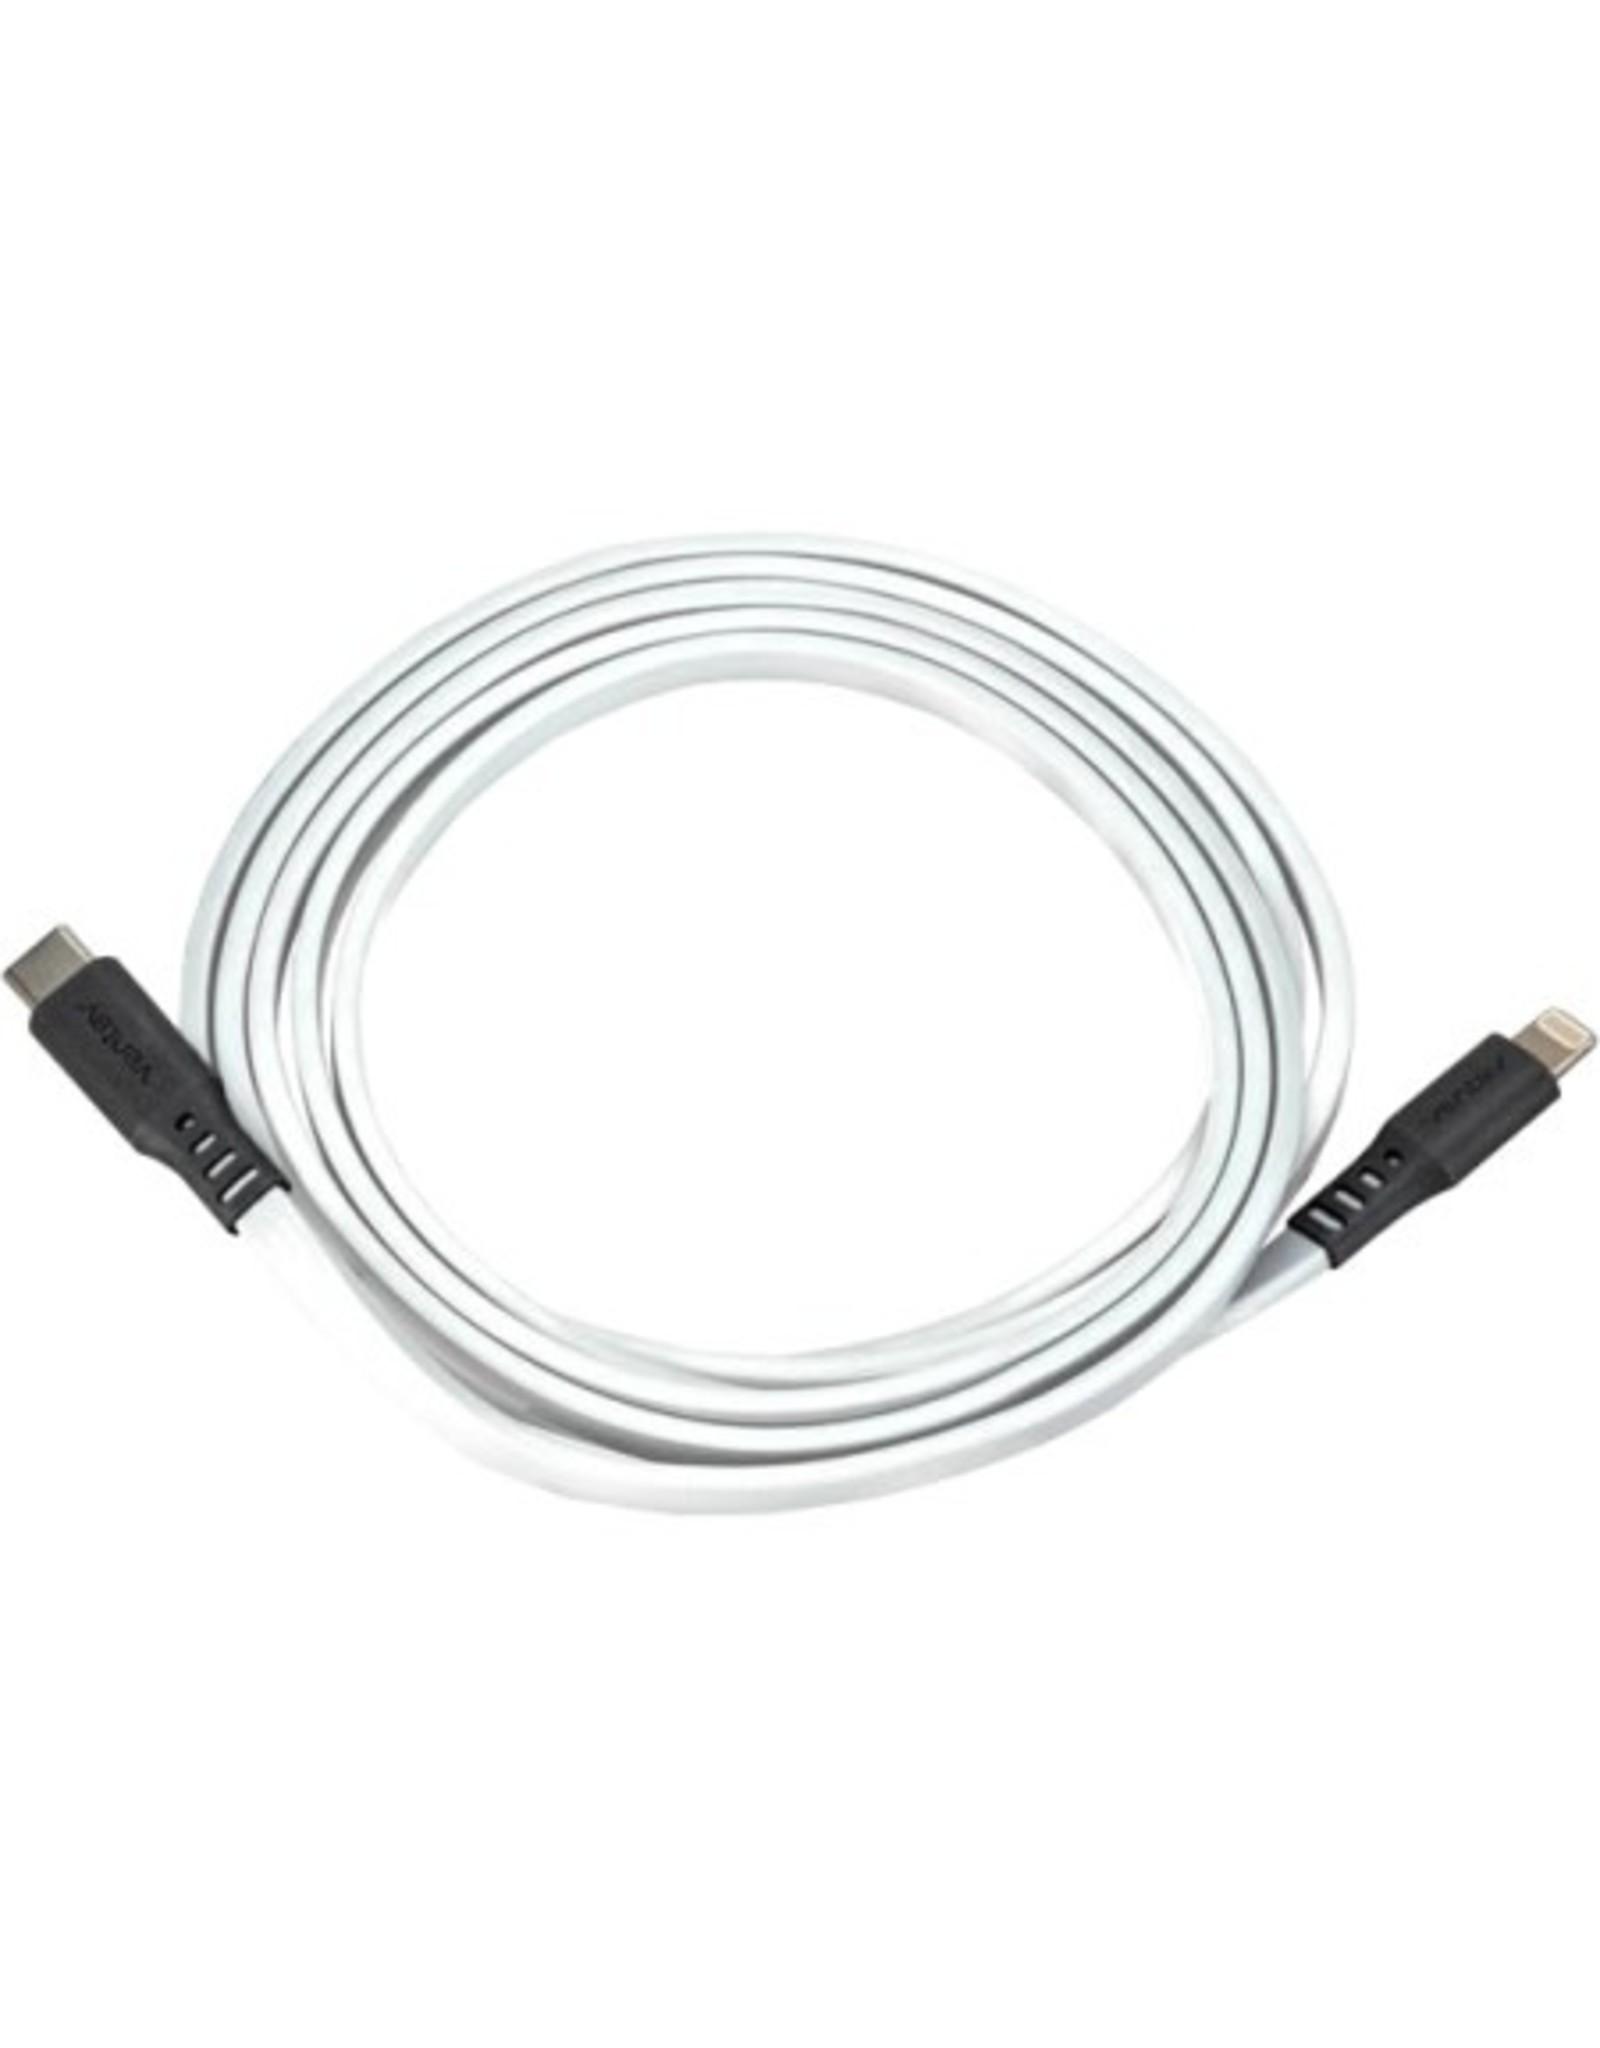 Ventev Ventev 6ft Charge & Sync Lightning to USB-C, White Flat SKU:49692